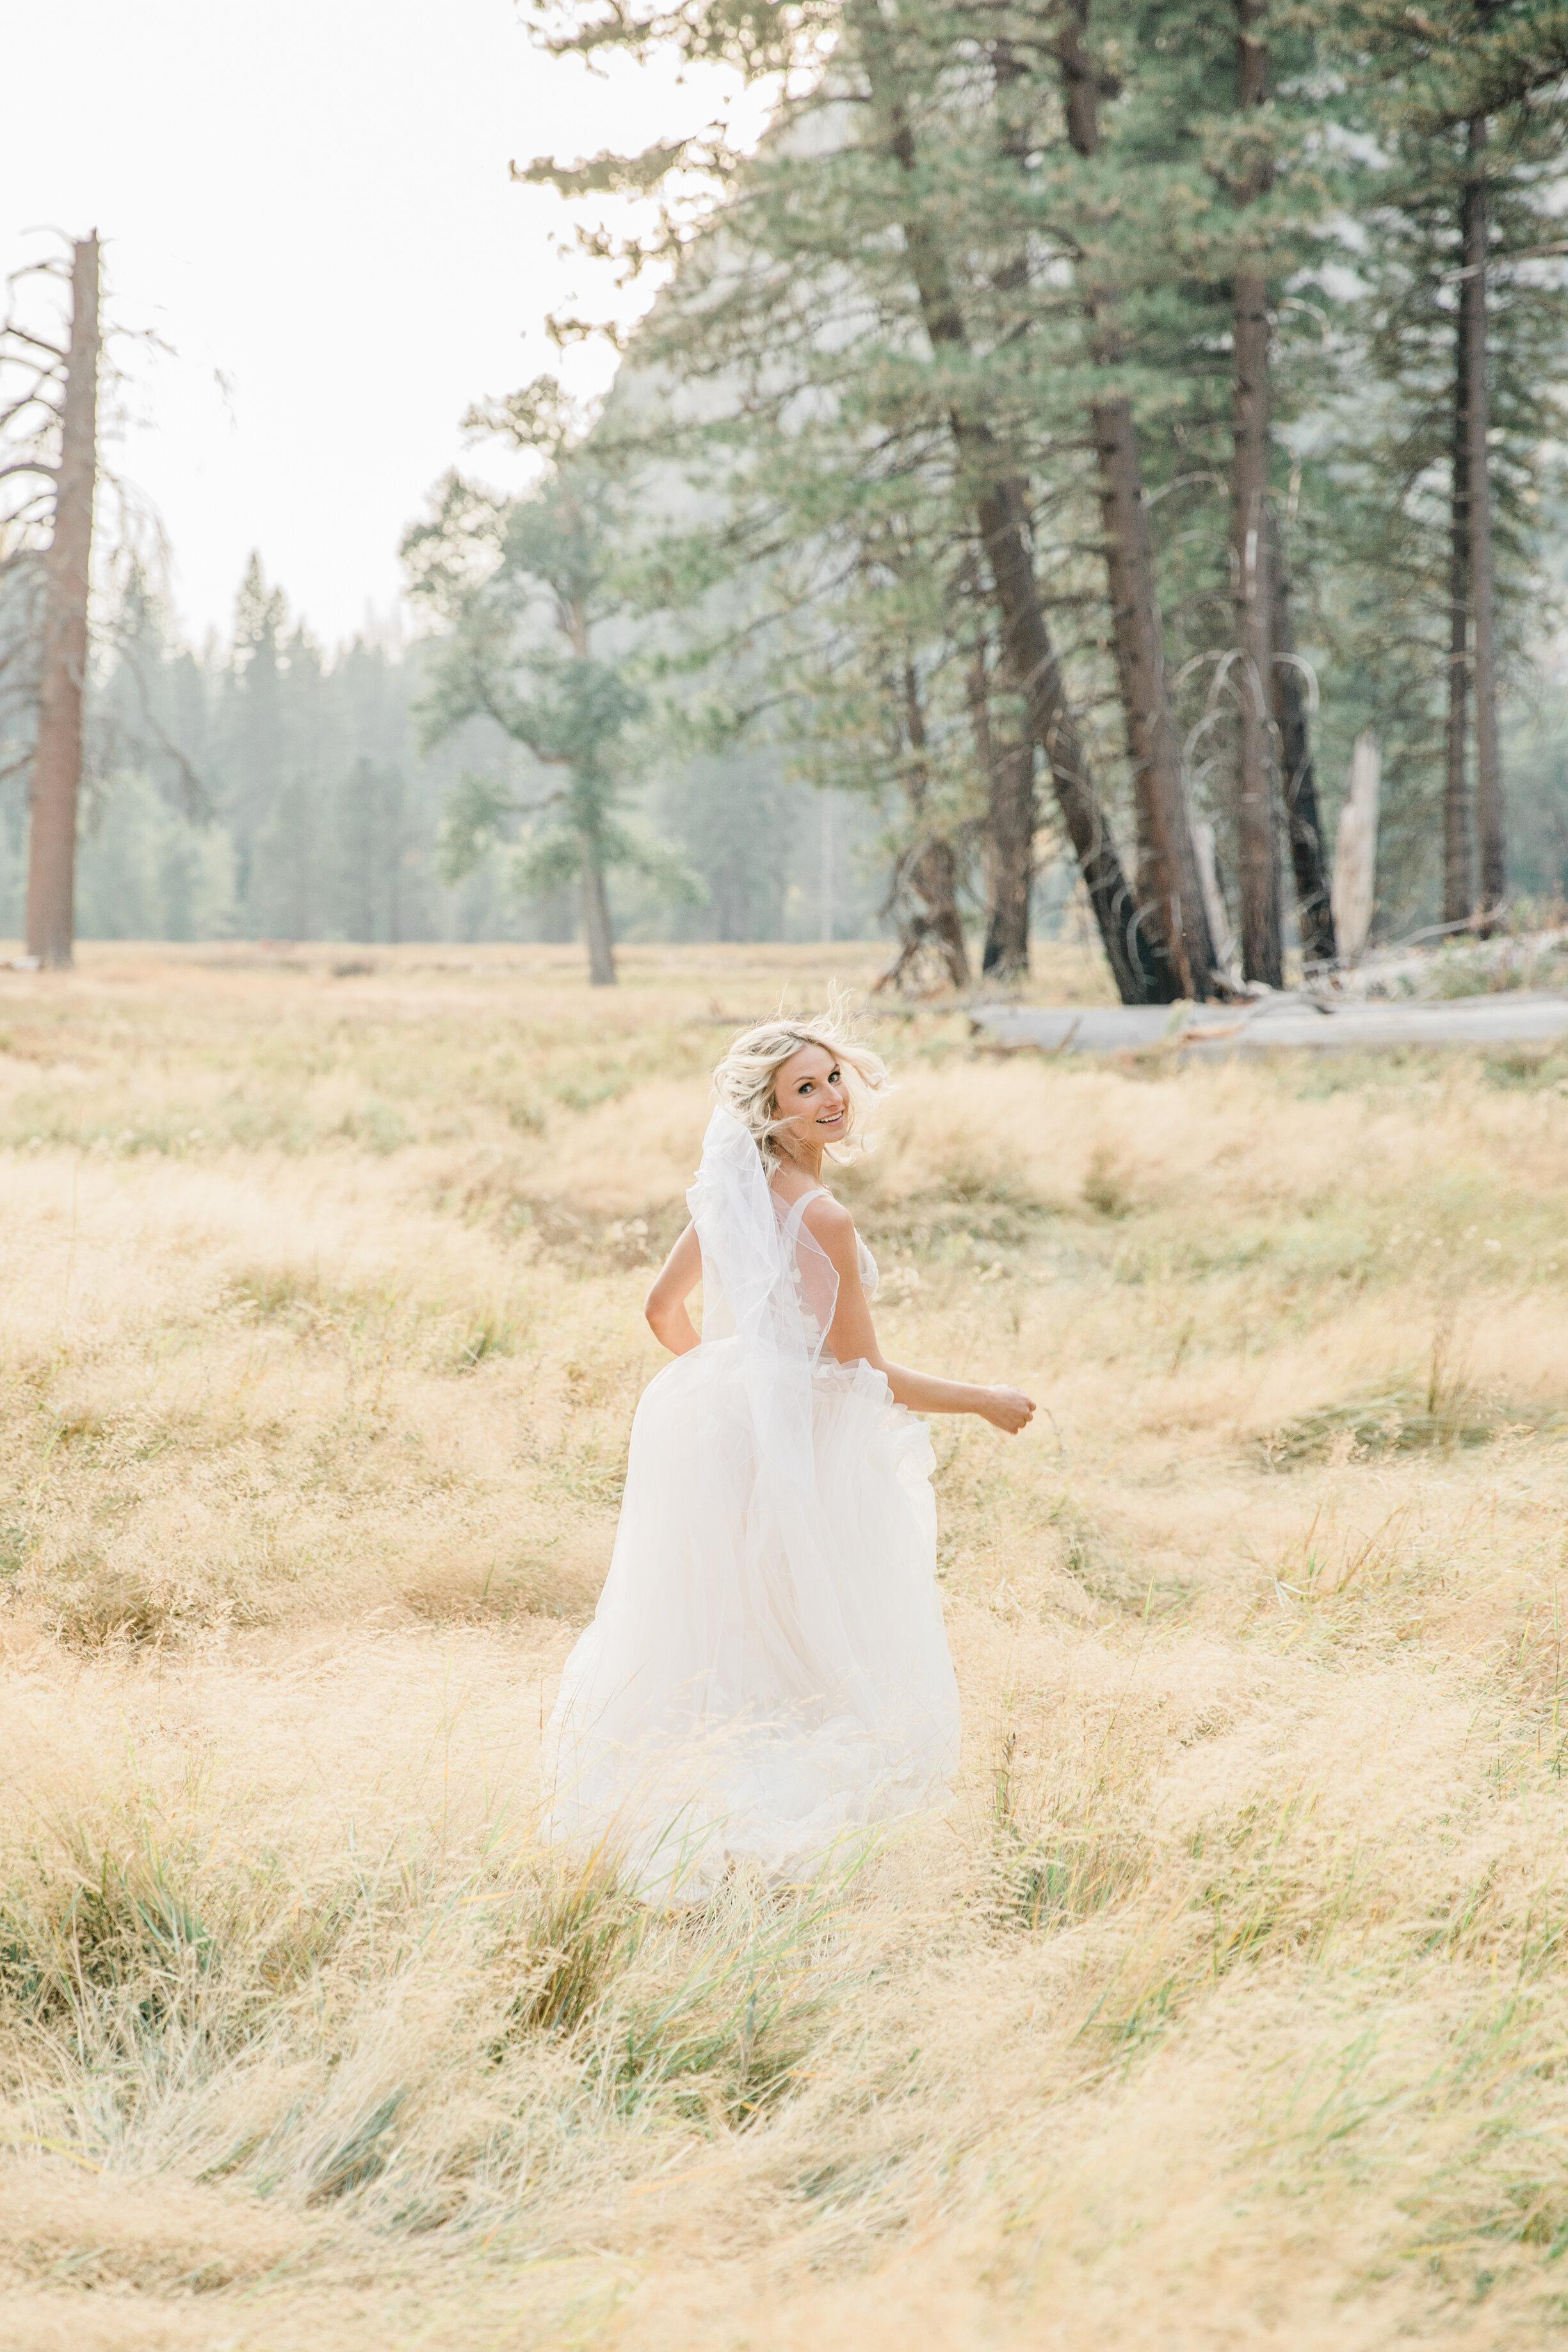 Leanne and Joe - Married - Sneak Peeks - Lauren Alisse Photography-40.jpg